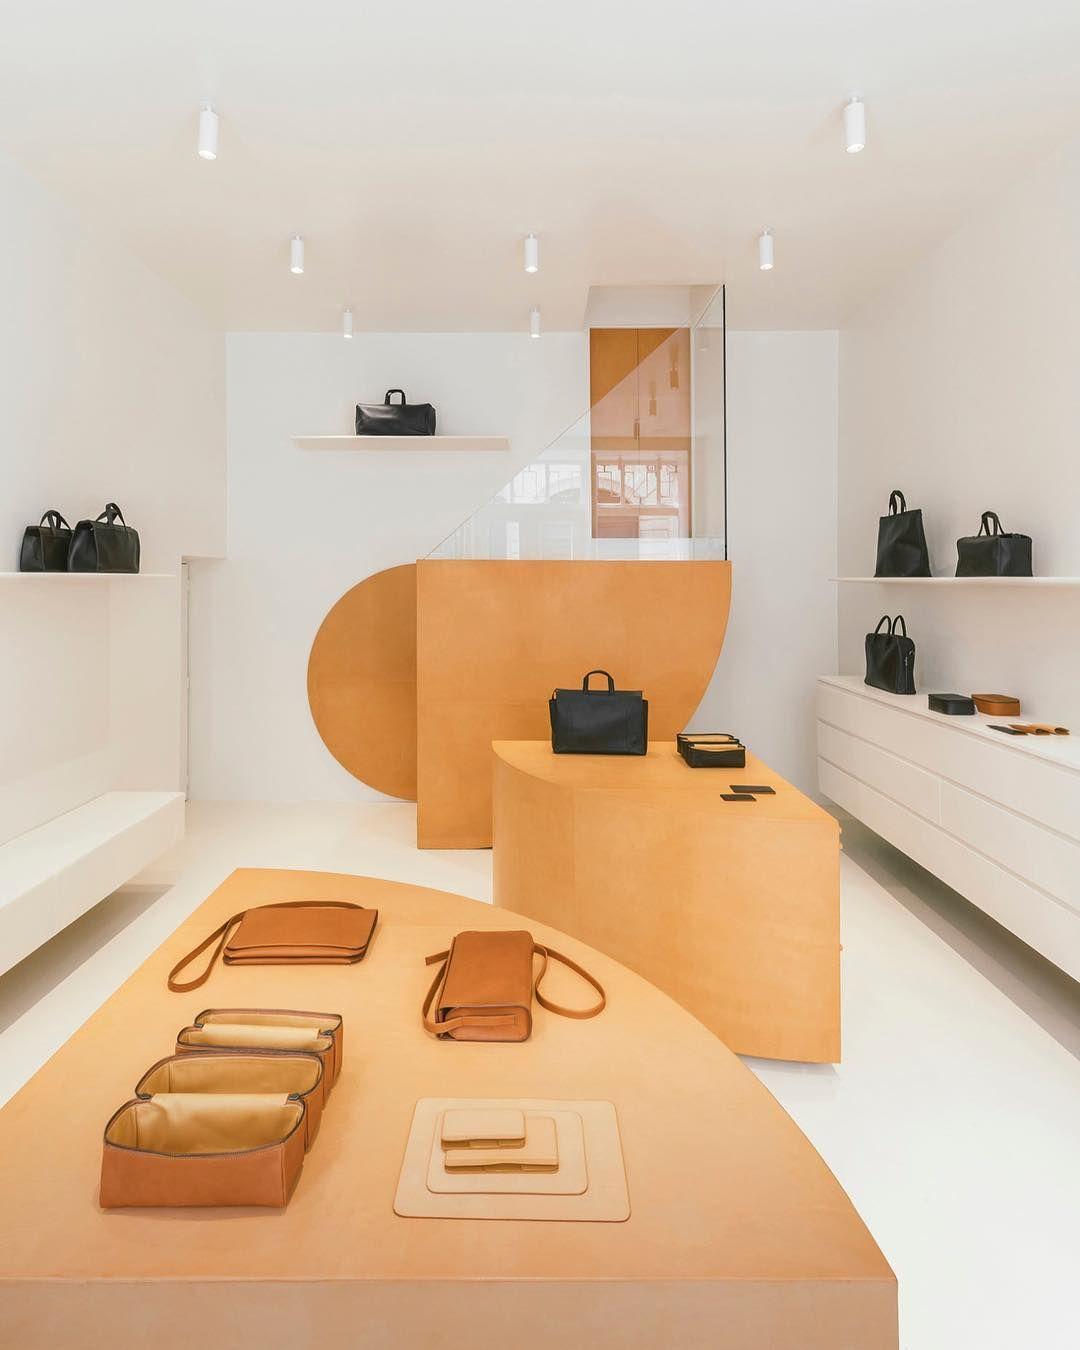 Isaac Reina by Bernard Dubois Paris, France #retaildesign   Retail design,  Interior design furniture, Retail interior